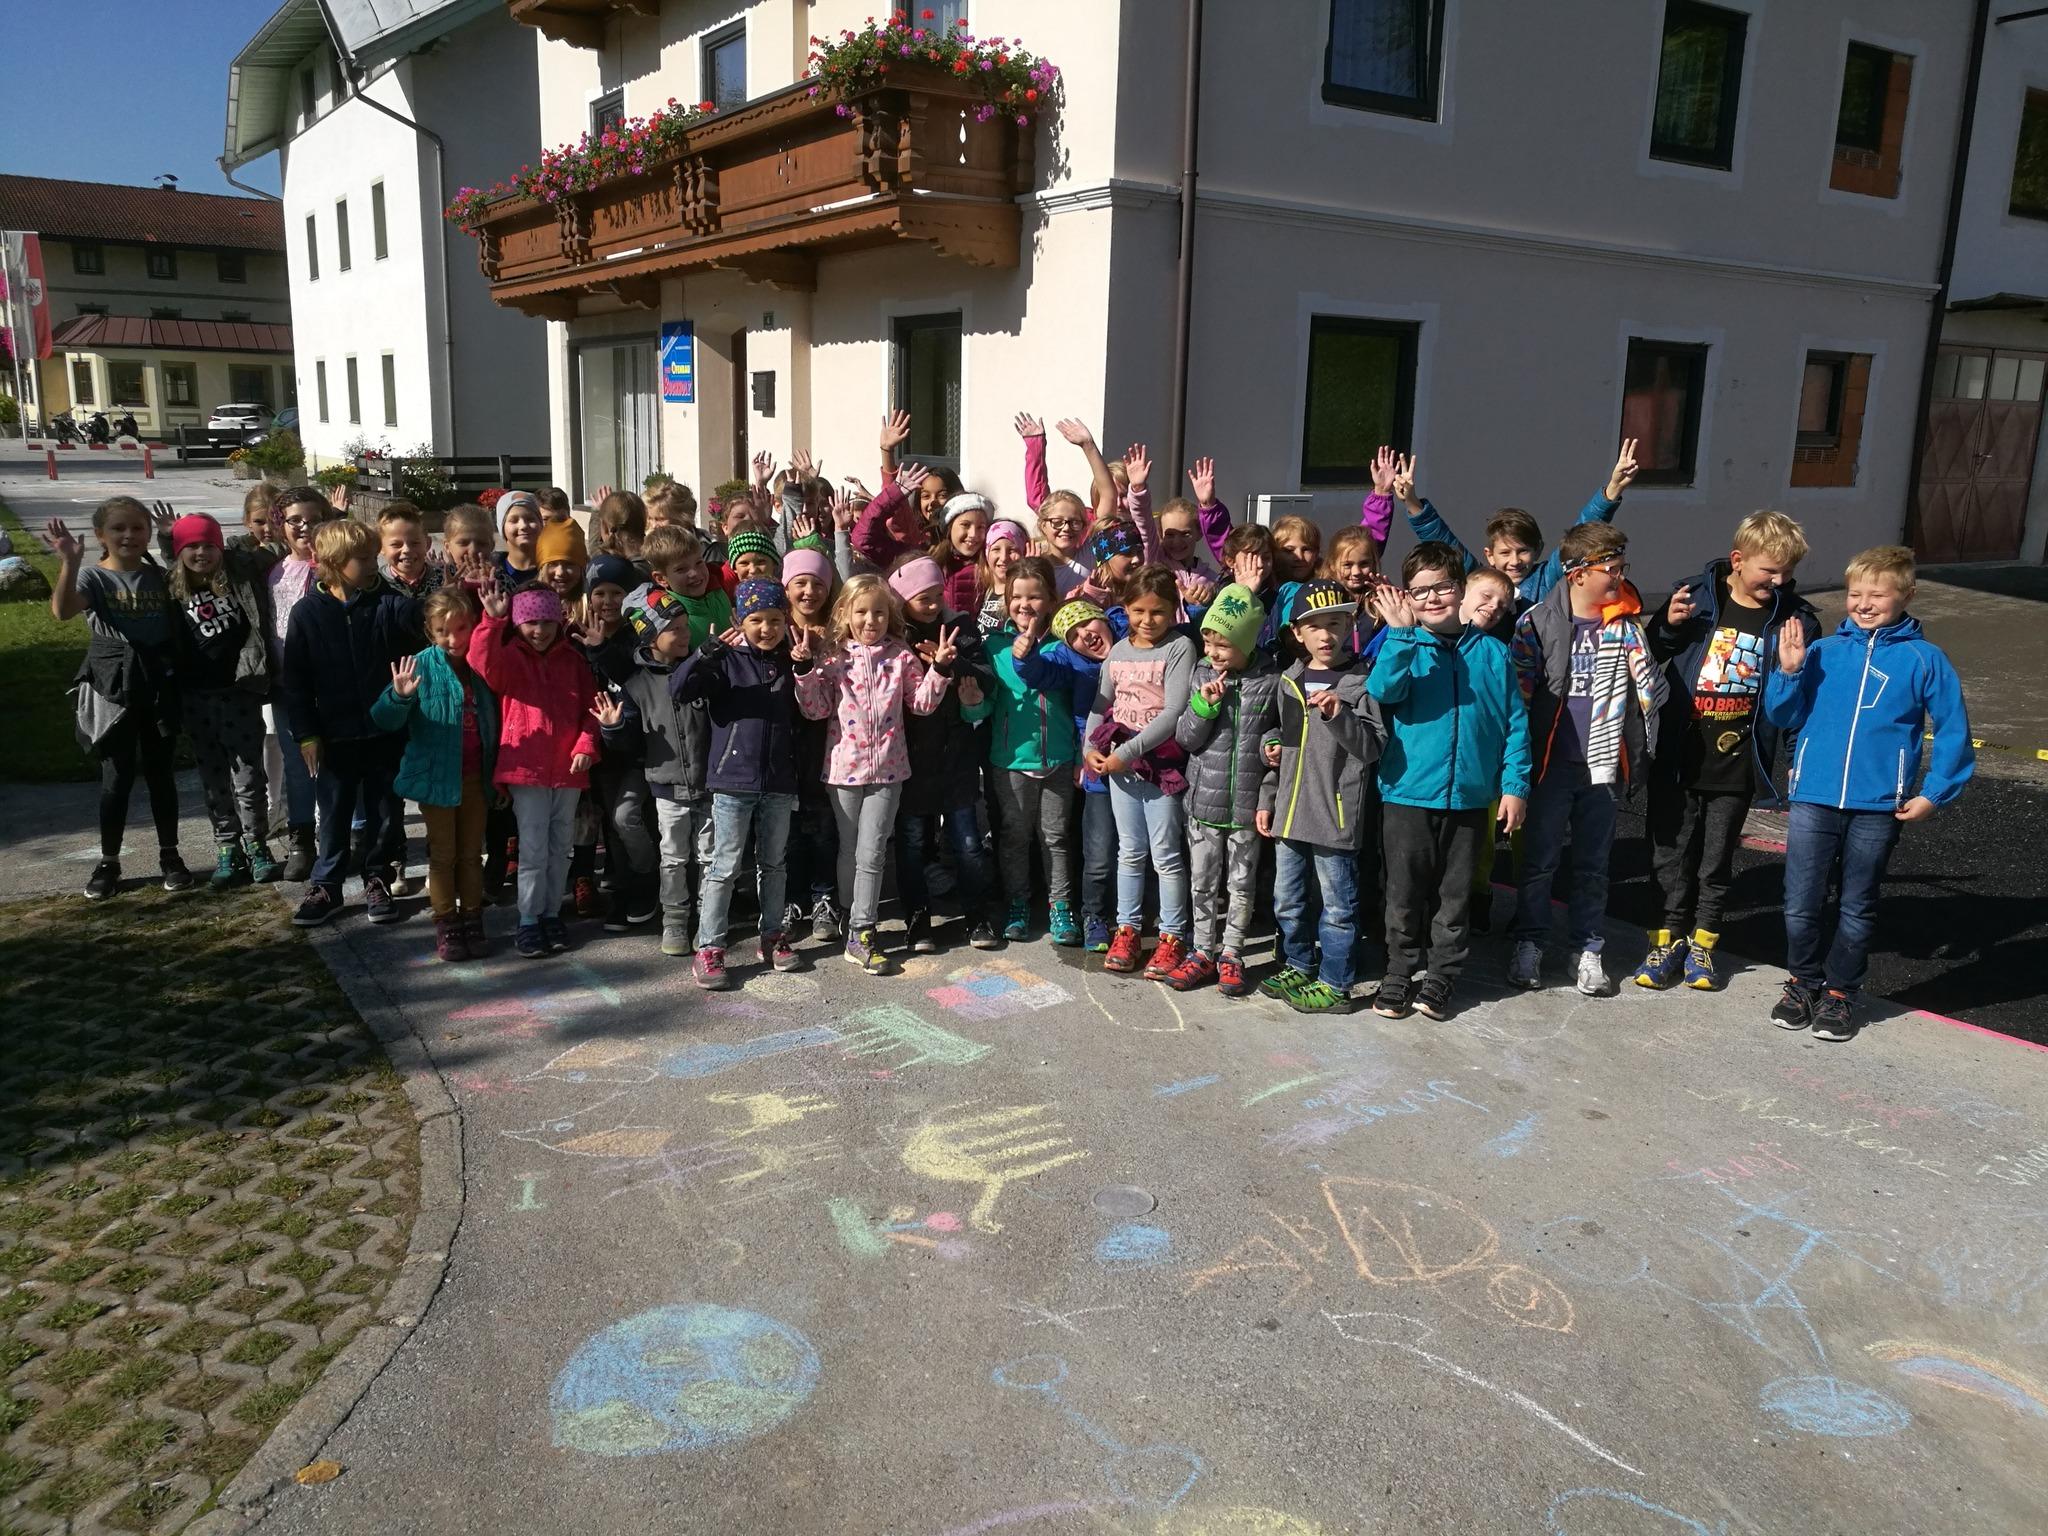 Breitenbach am inn singleborse - Partnersuche senioren aus